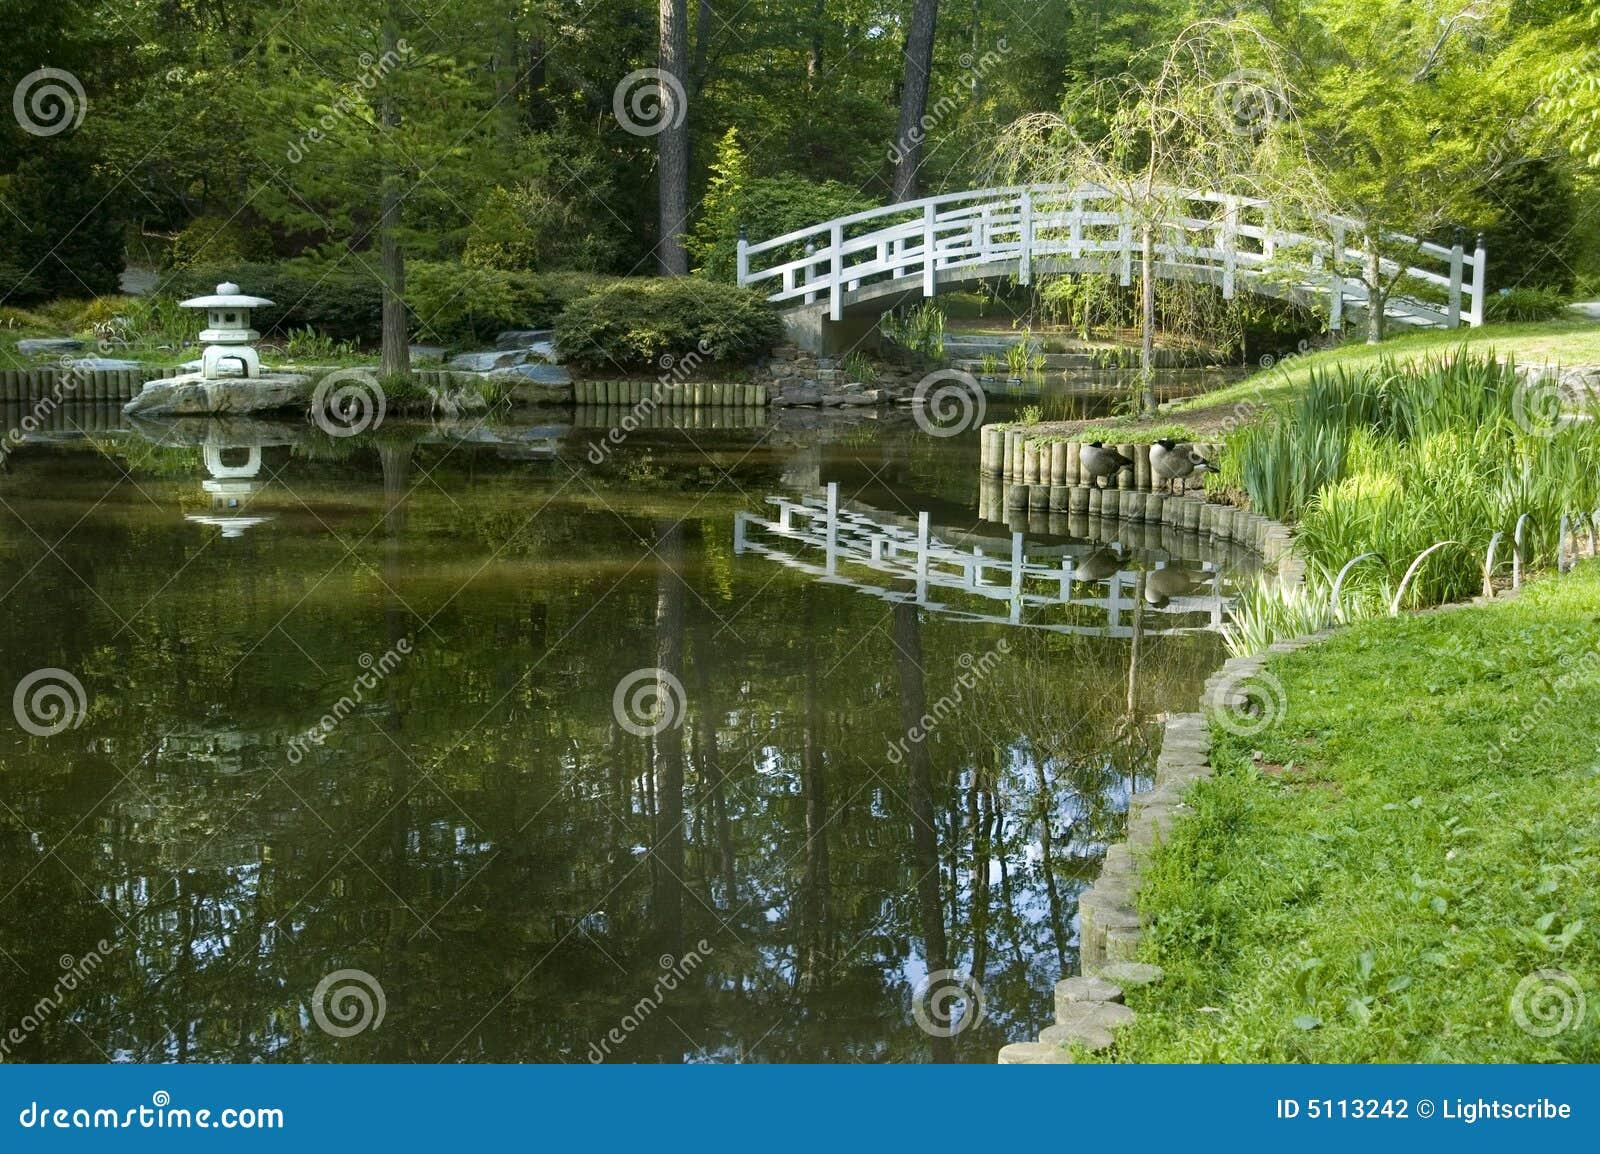 Chinesischer Garten Brucke | rheumri.com